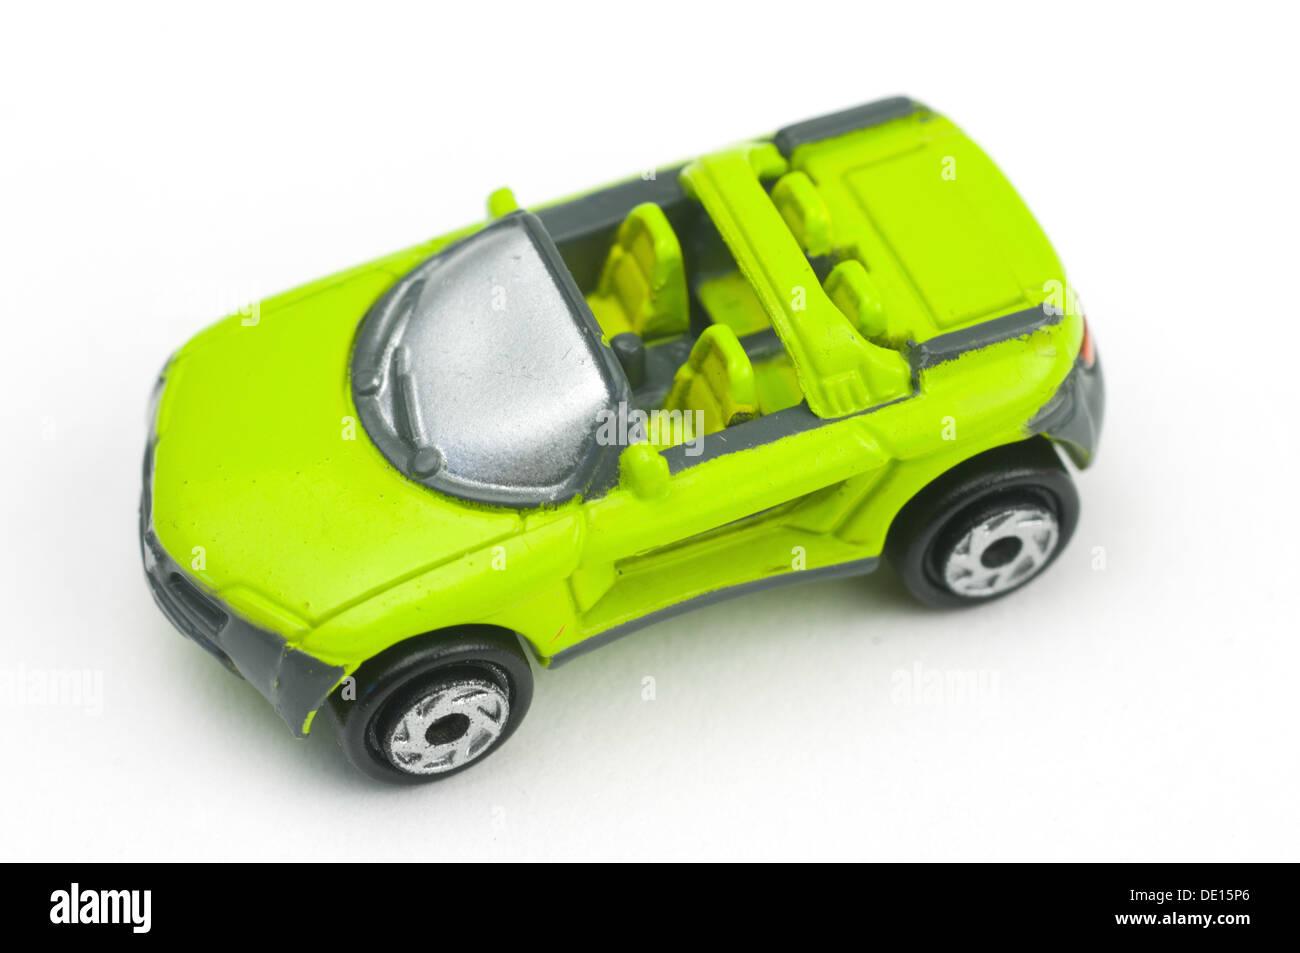 """Micro Machines' par les jouets Hasbro Photo Stock"